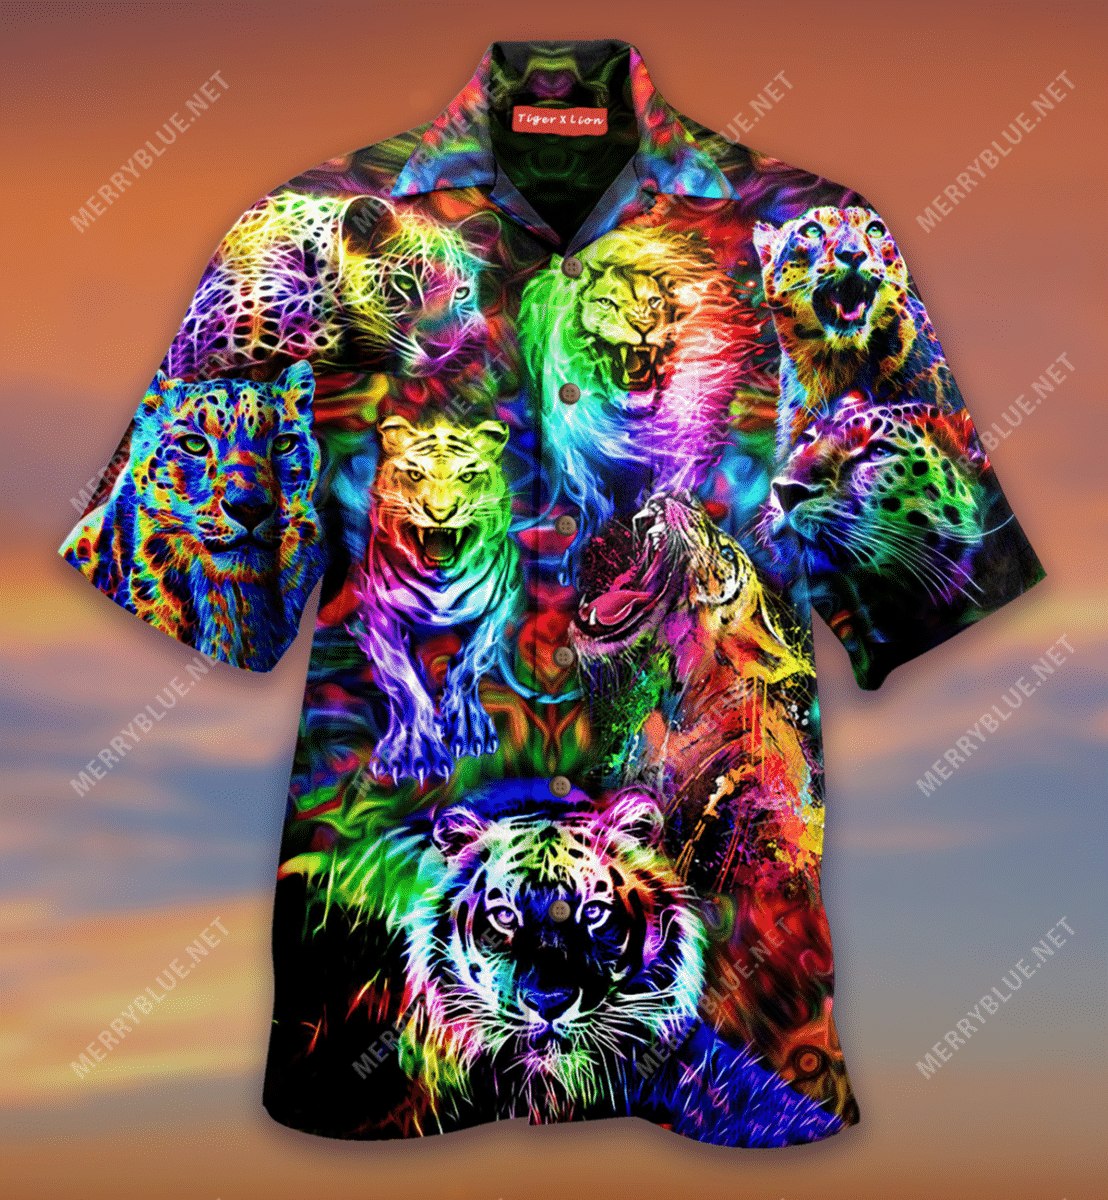 Top 10 Hawaiian shirt in Summer Part 1